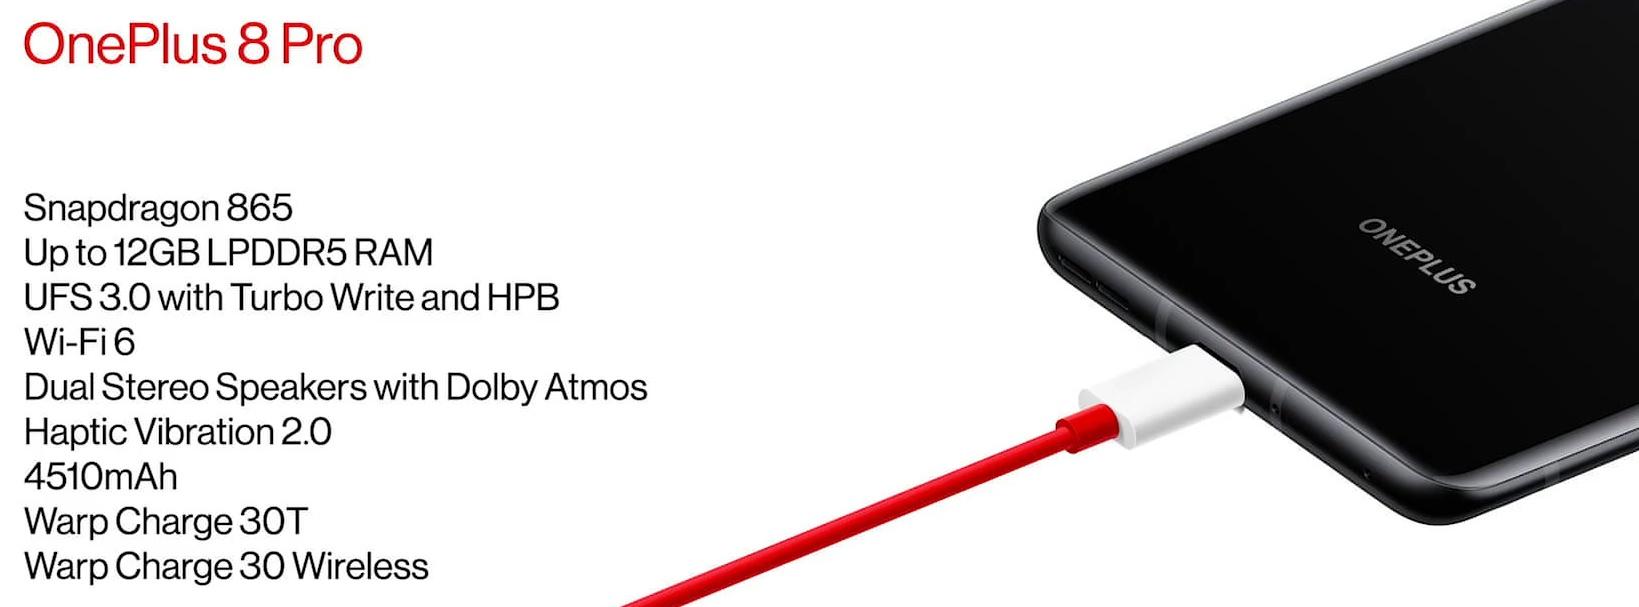 OnePlus 8 Pro - Snapdragon 865